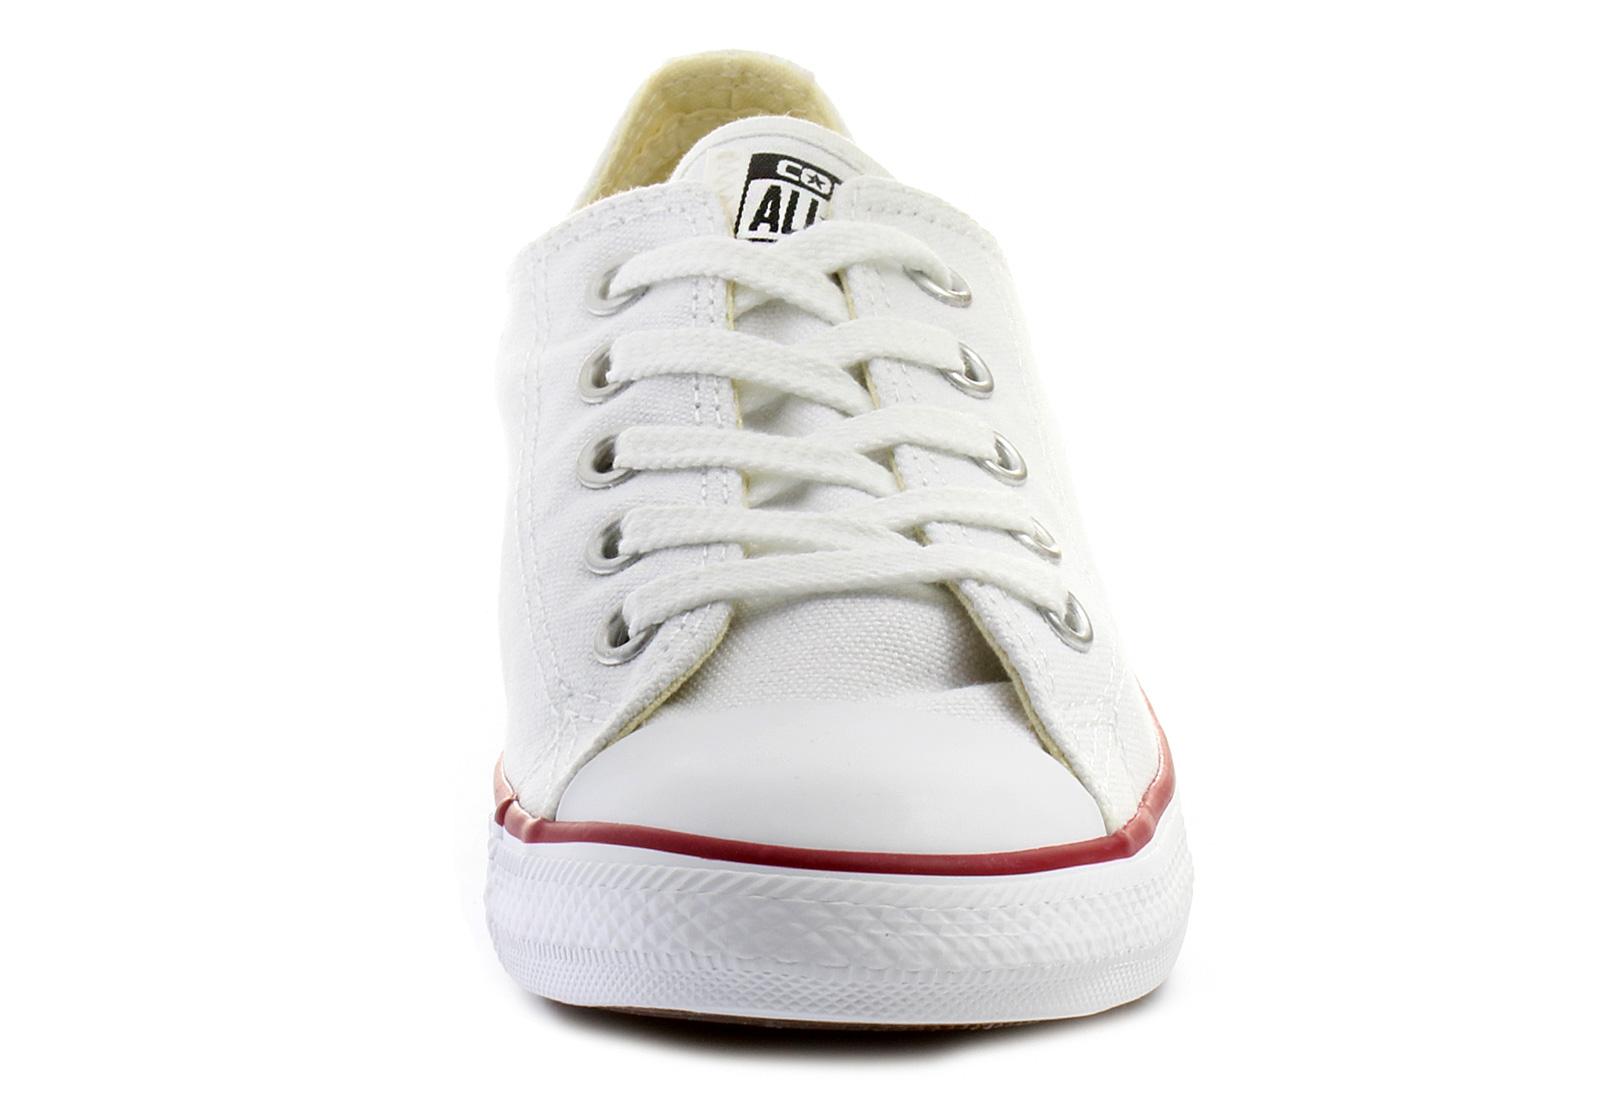 Converse Tornacipő - Ct As Dainty Ox - 537204C - Office Shoes ... 7623d3f35a